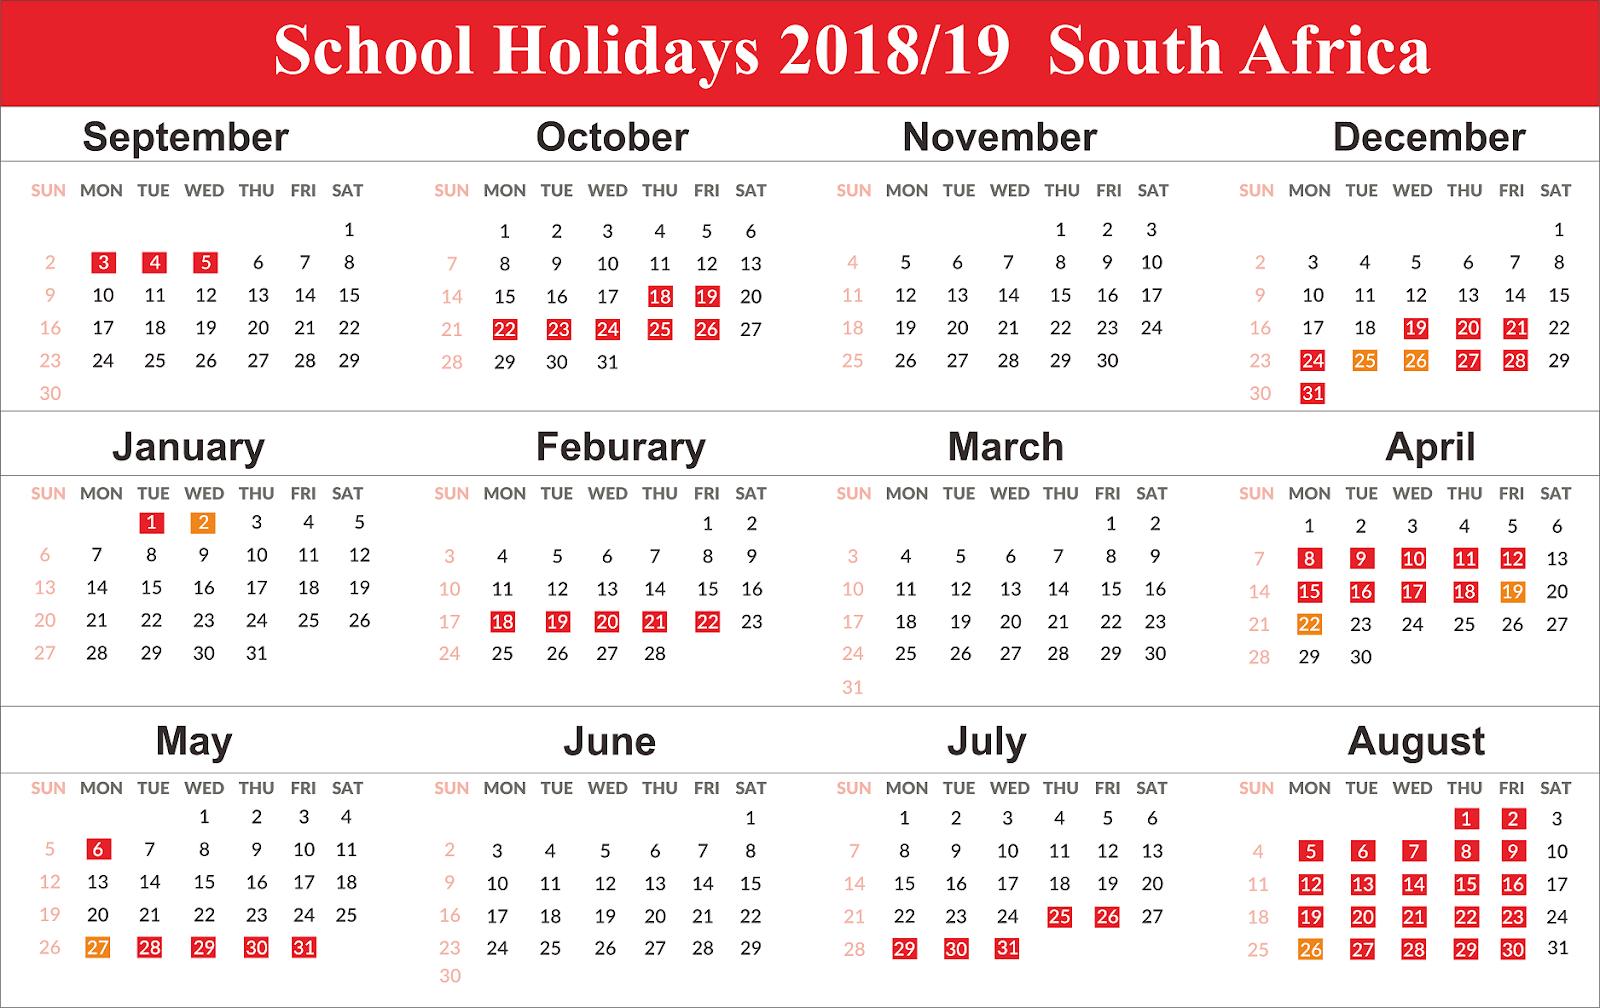 Free School Holidays Calendar 2019 South Africa Templates S A School Calendar 2019